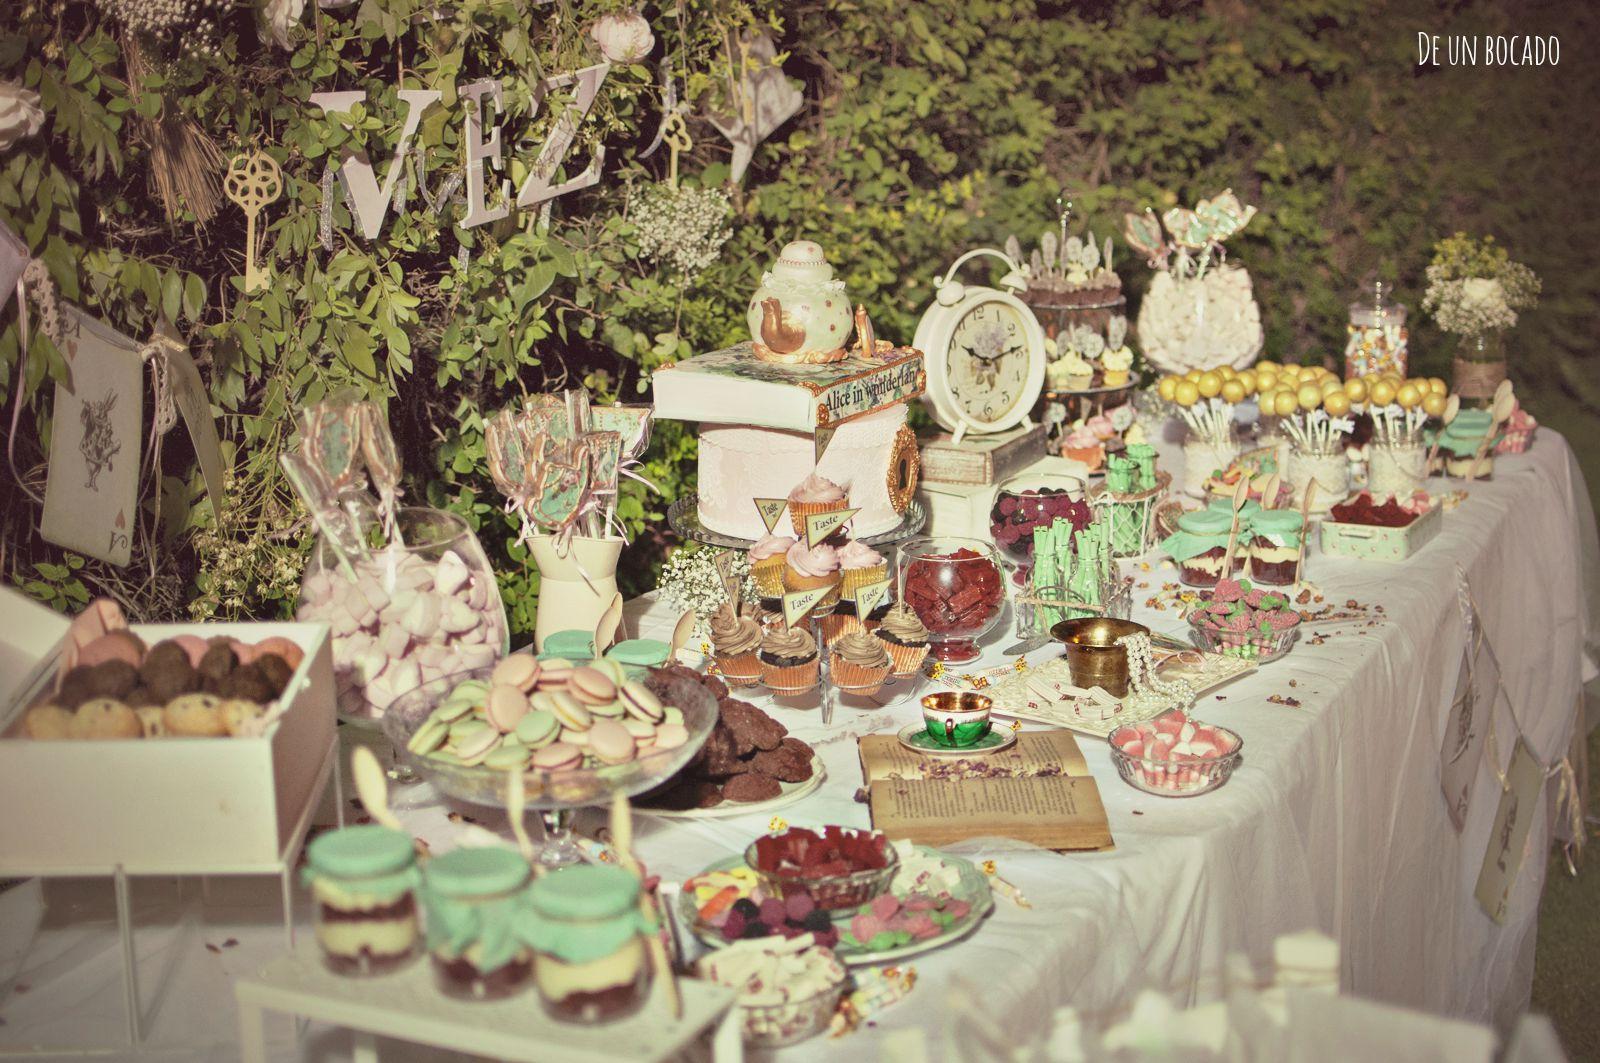 Matrimonio Alice In Wonderland : Alice in wonderland wedding sweet buffet mesa dulce de